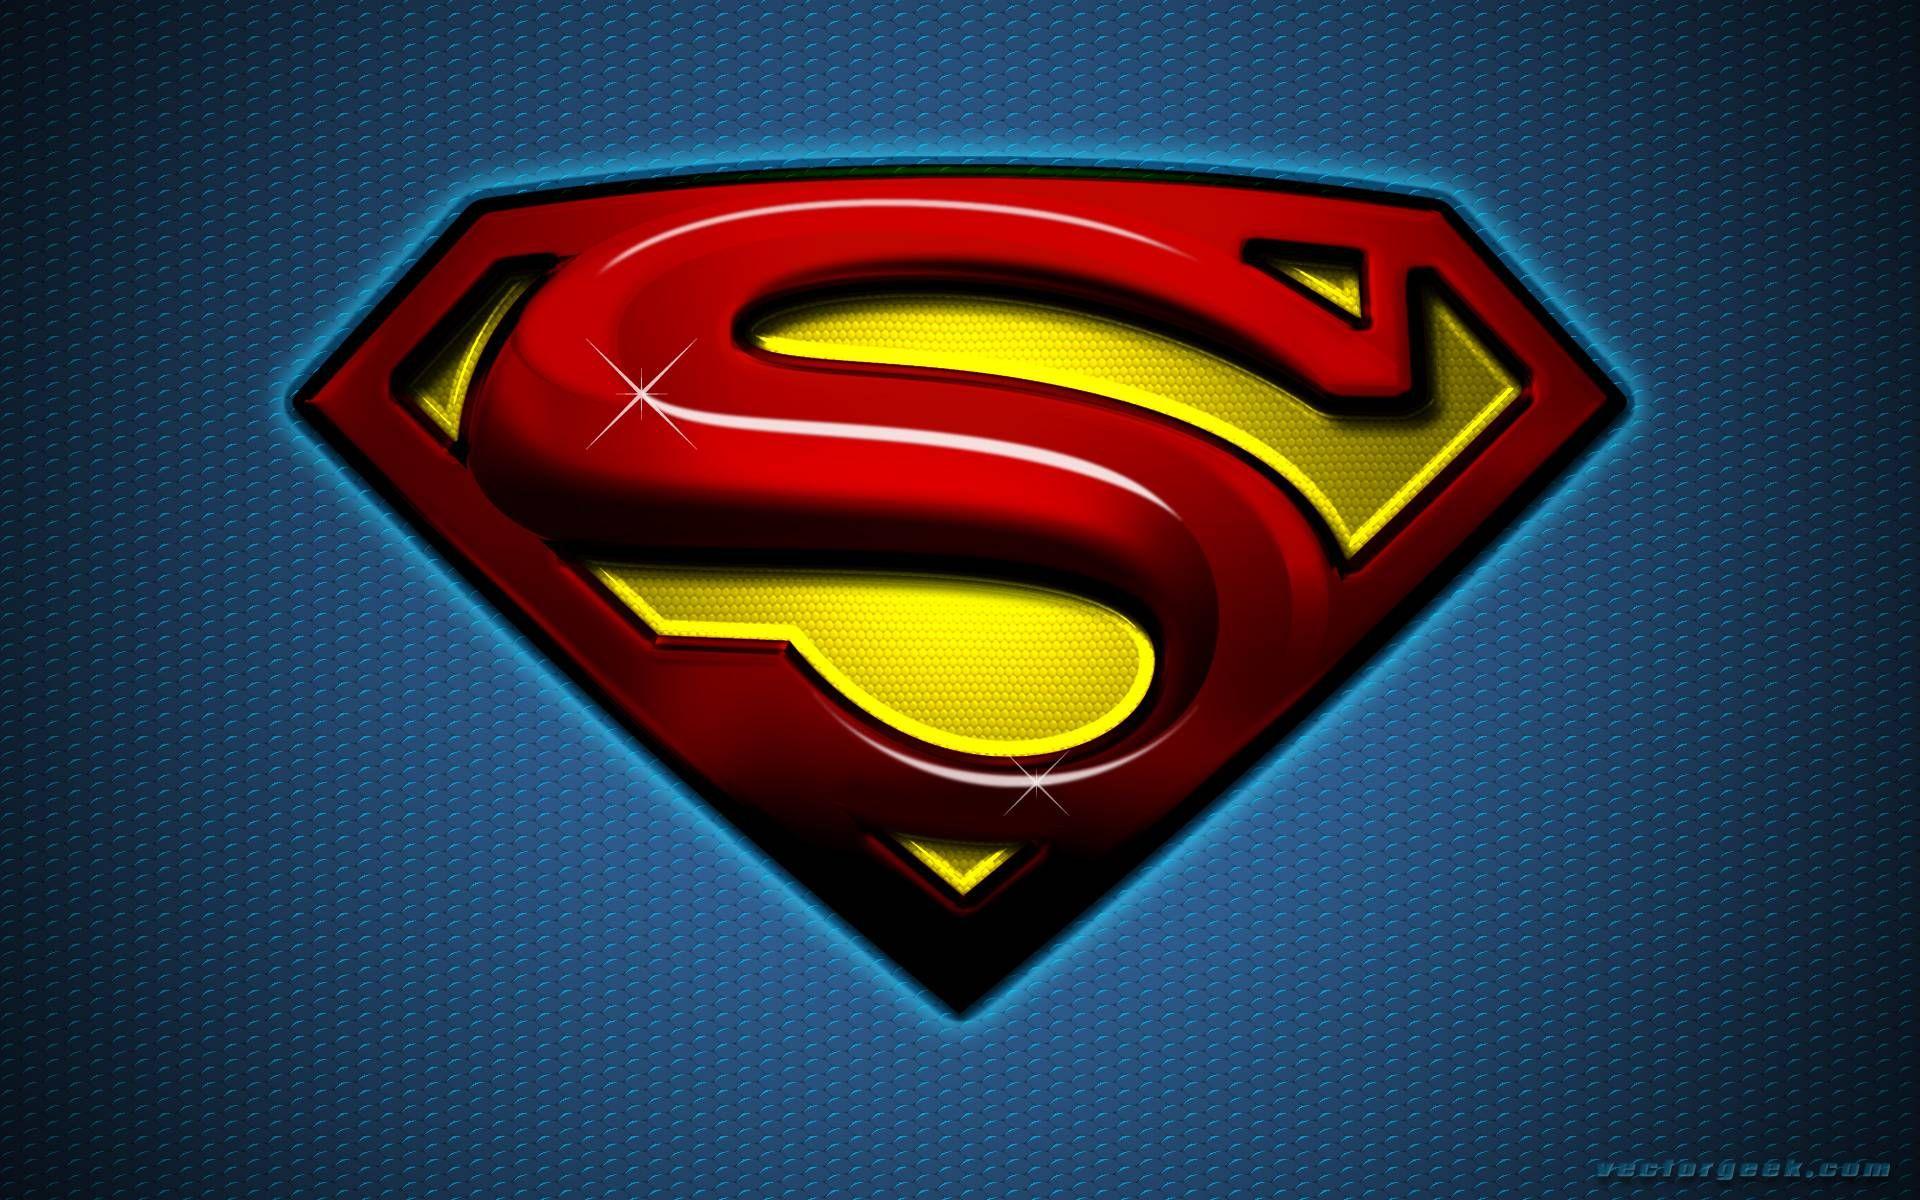 Superman Logo Wallpapers Full HD wallpaper search